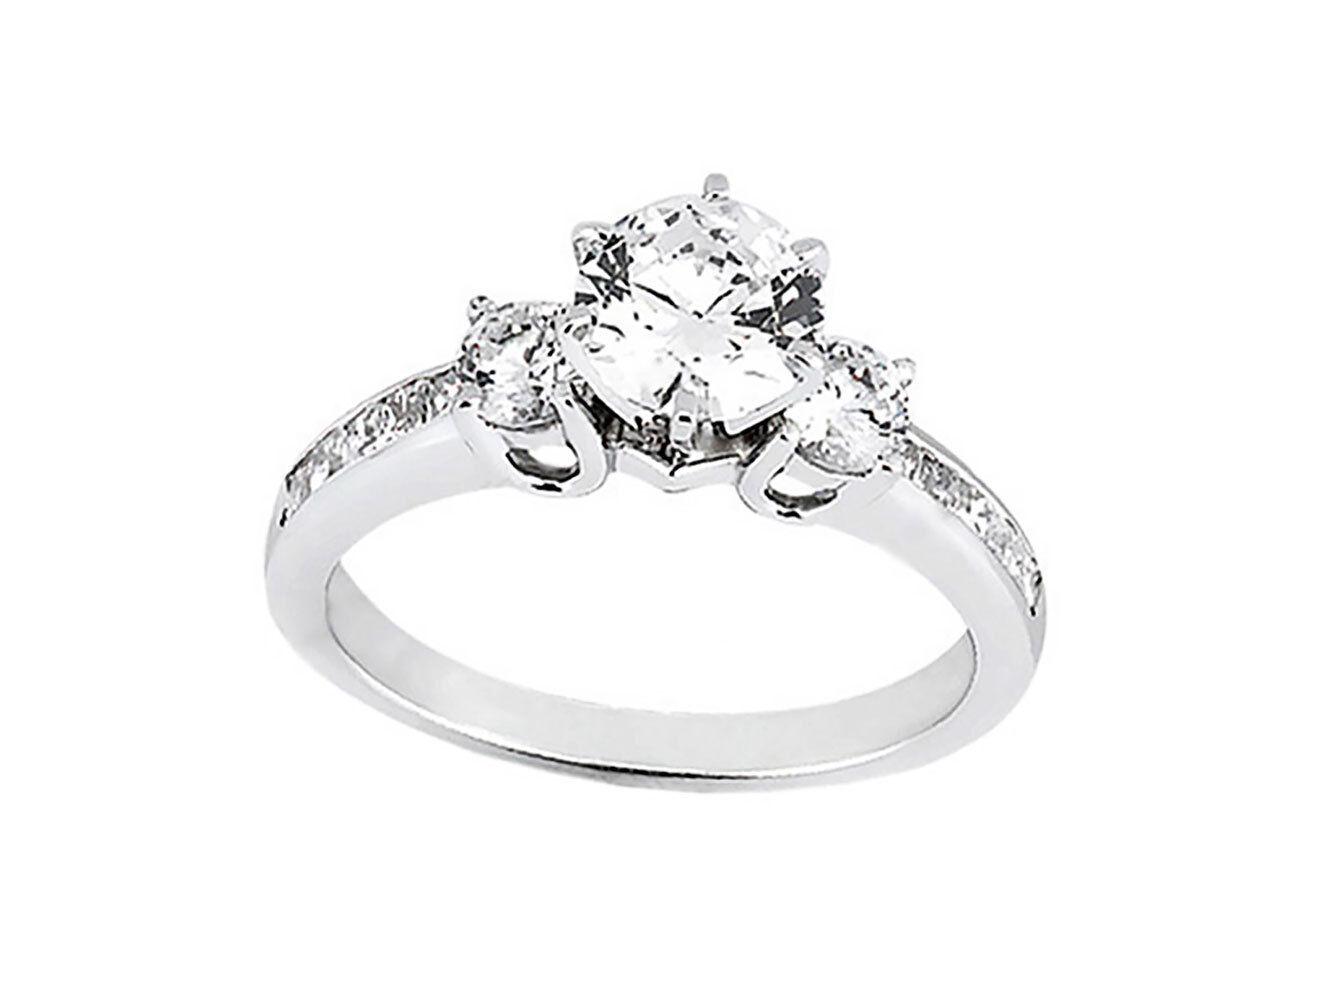 Genuine 1.25Ct Round Princess Round Cut Diamond Engagement Ring 14k gold IJ I1